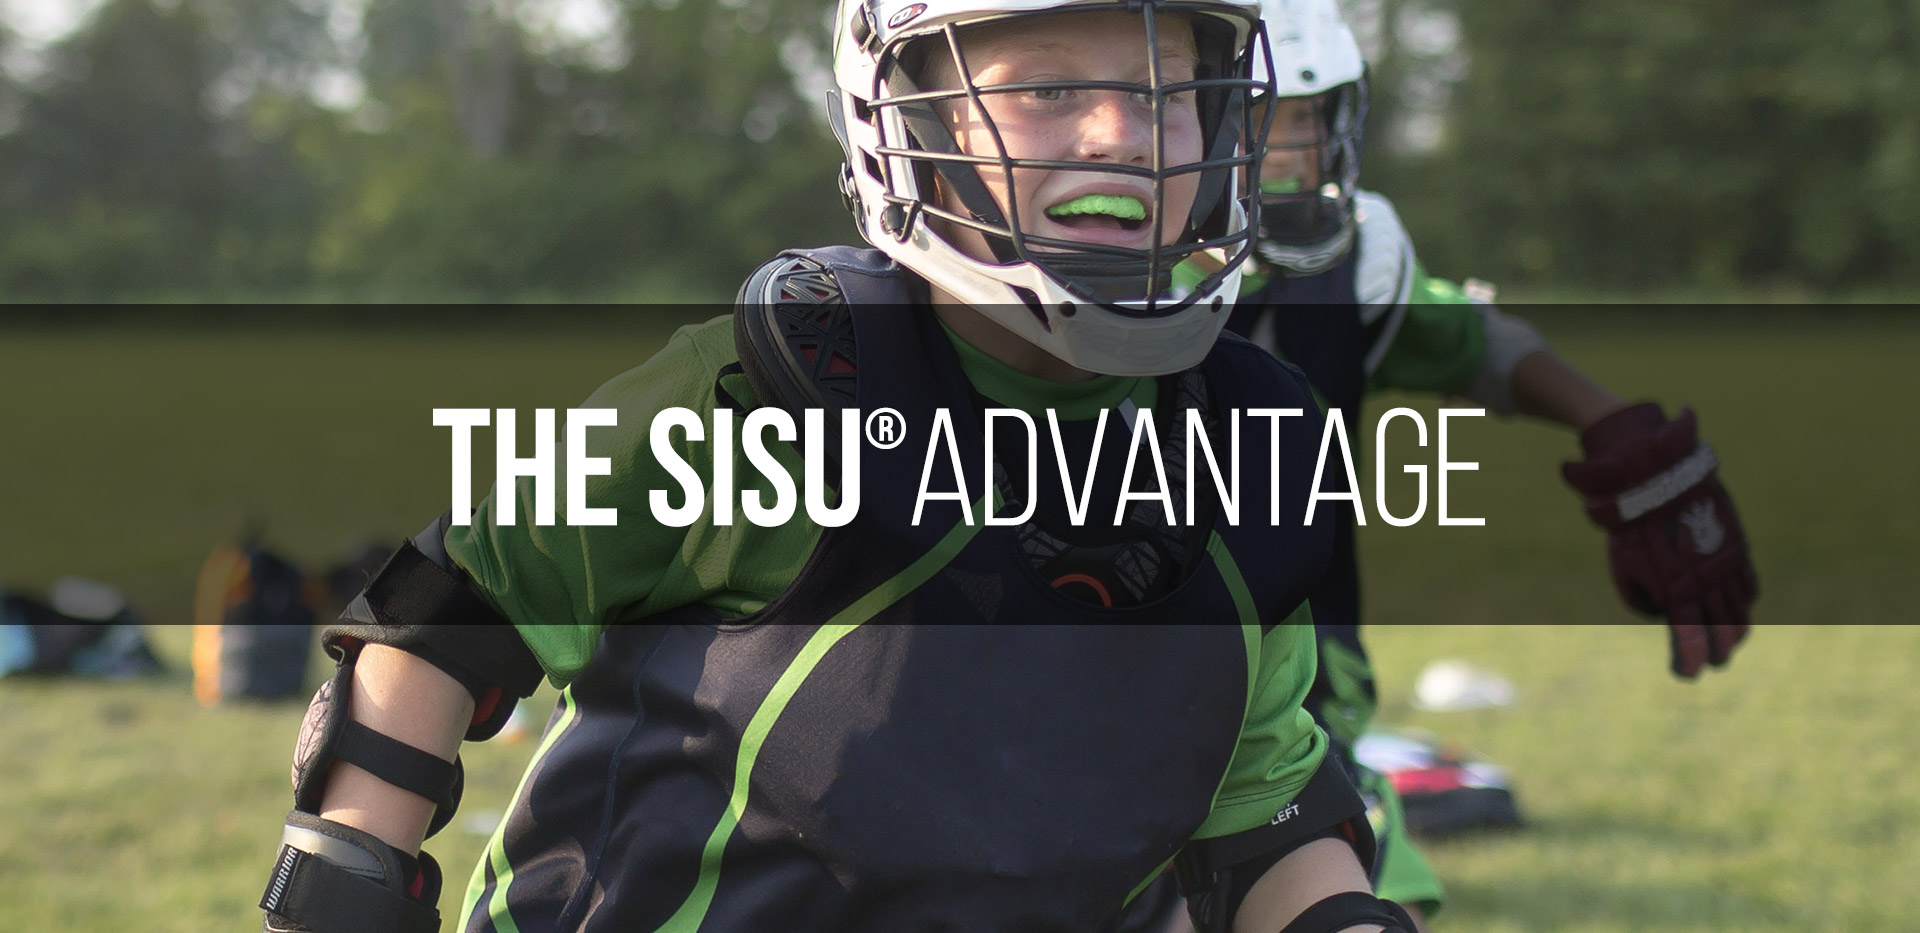 SISU Mouthguard benefits advantages